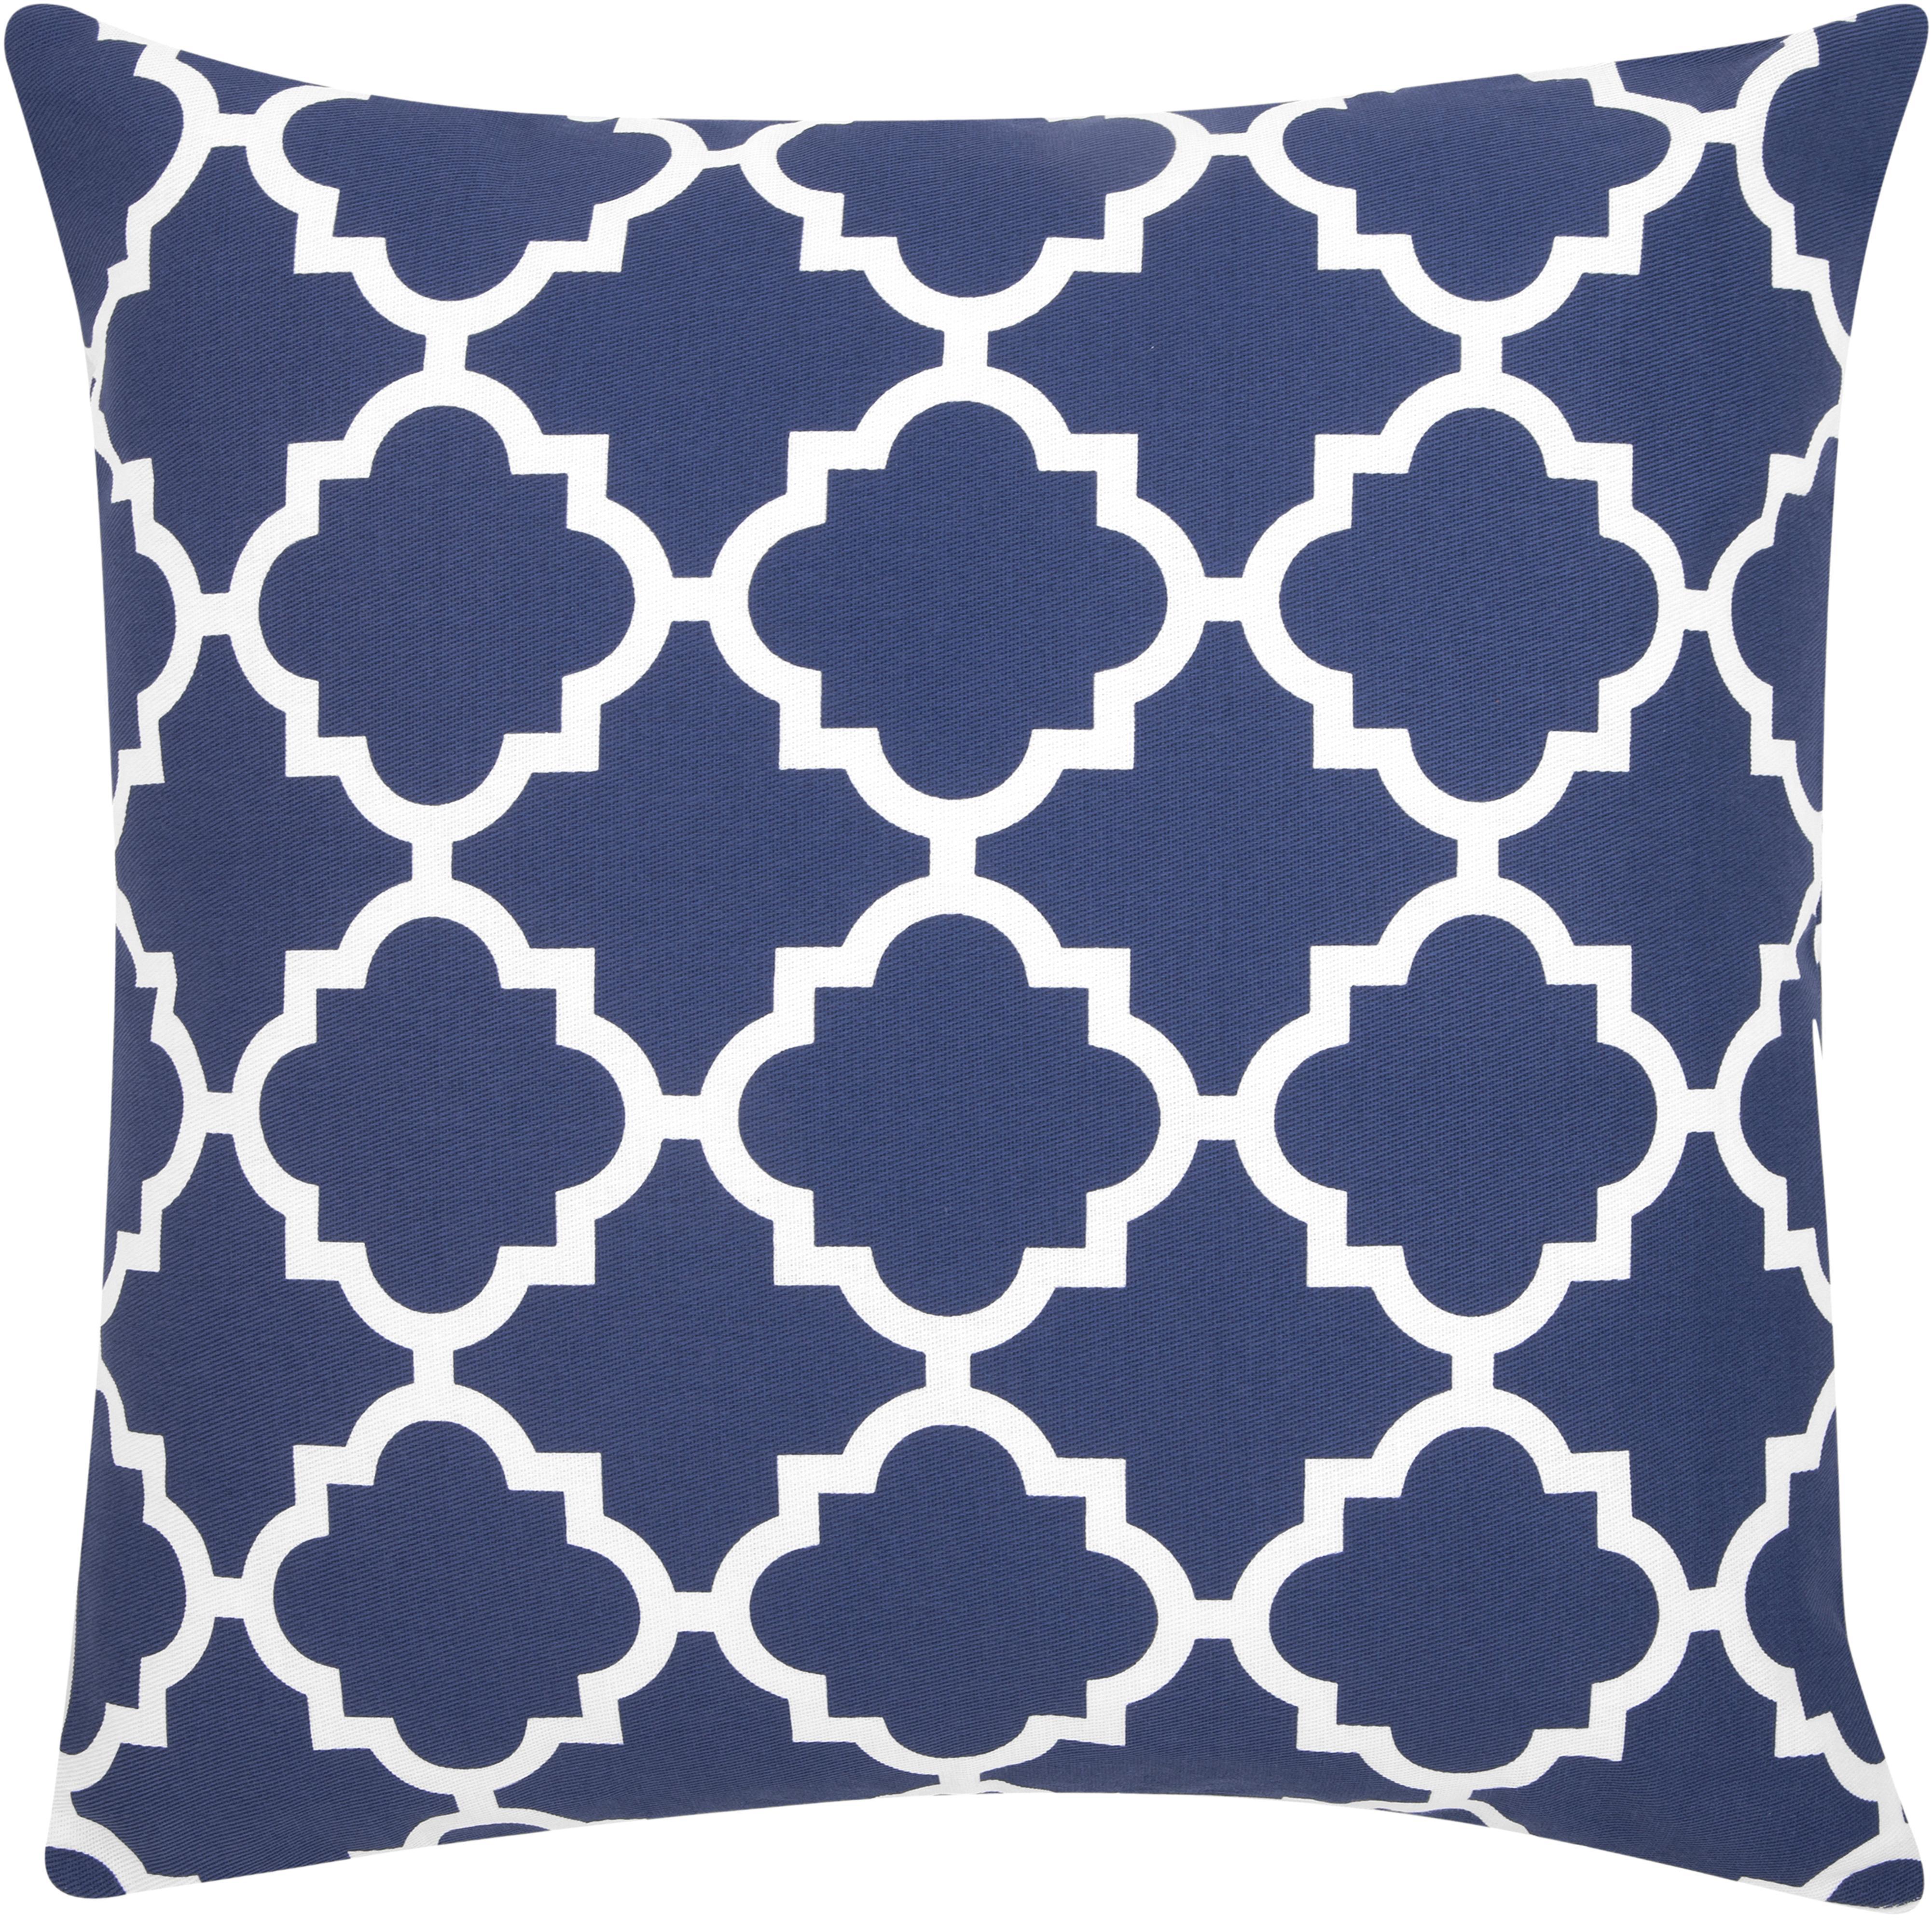 Federa arredo con motivi grafici Lana, Cotone, Blu marino, bianco, Larg. 45 x Lung. 45 cm